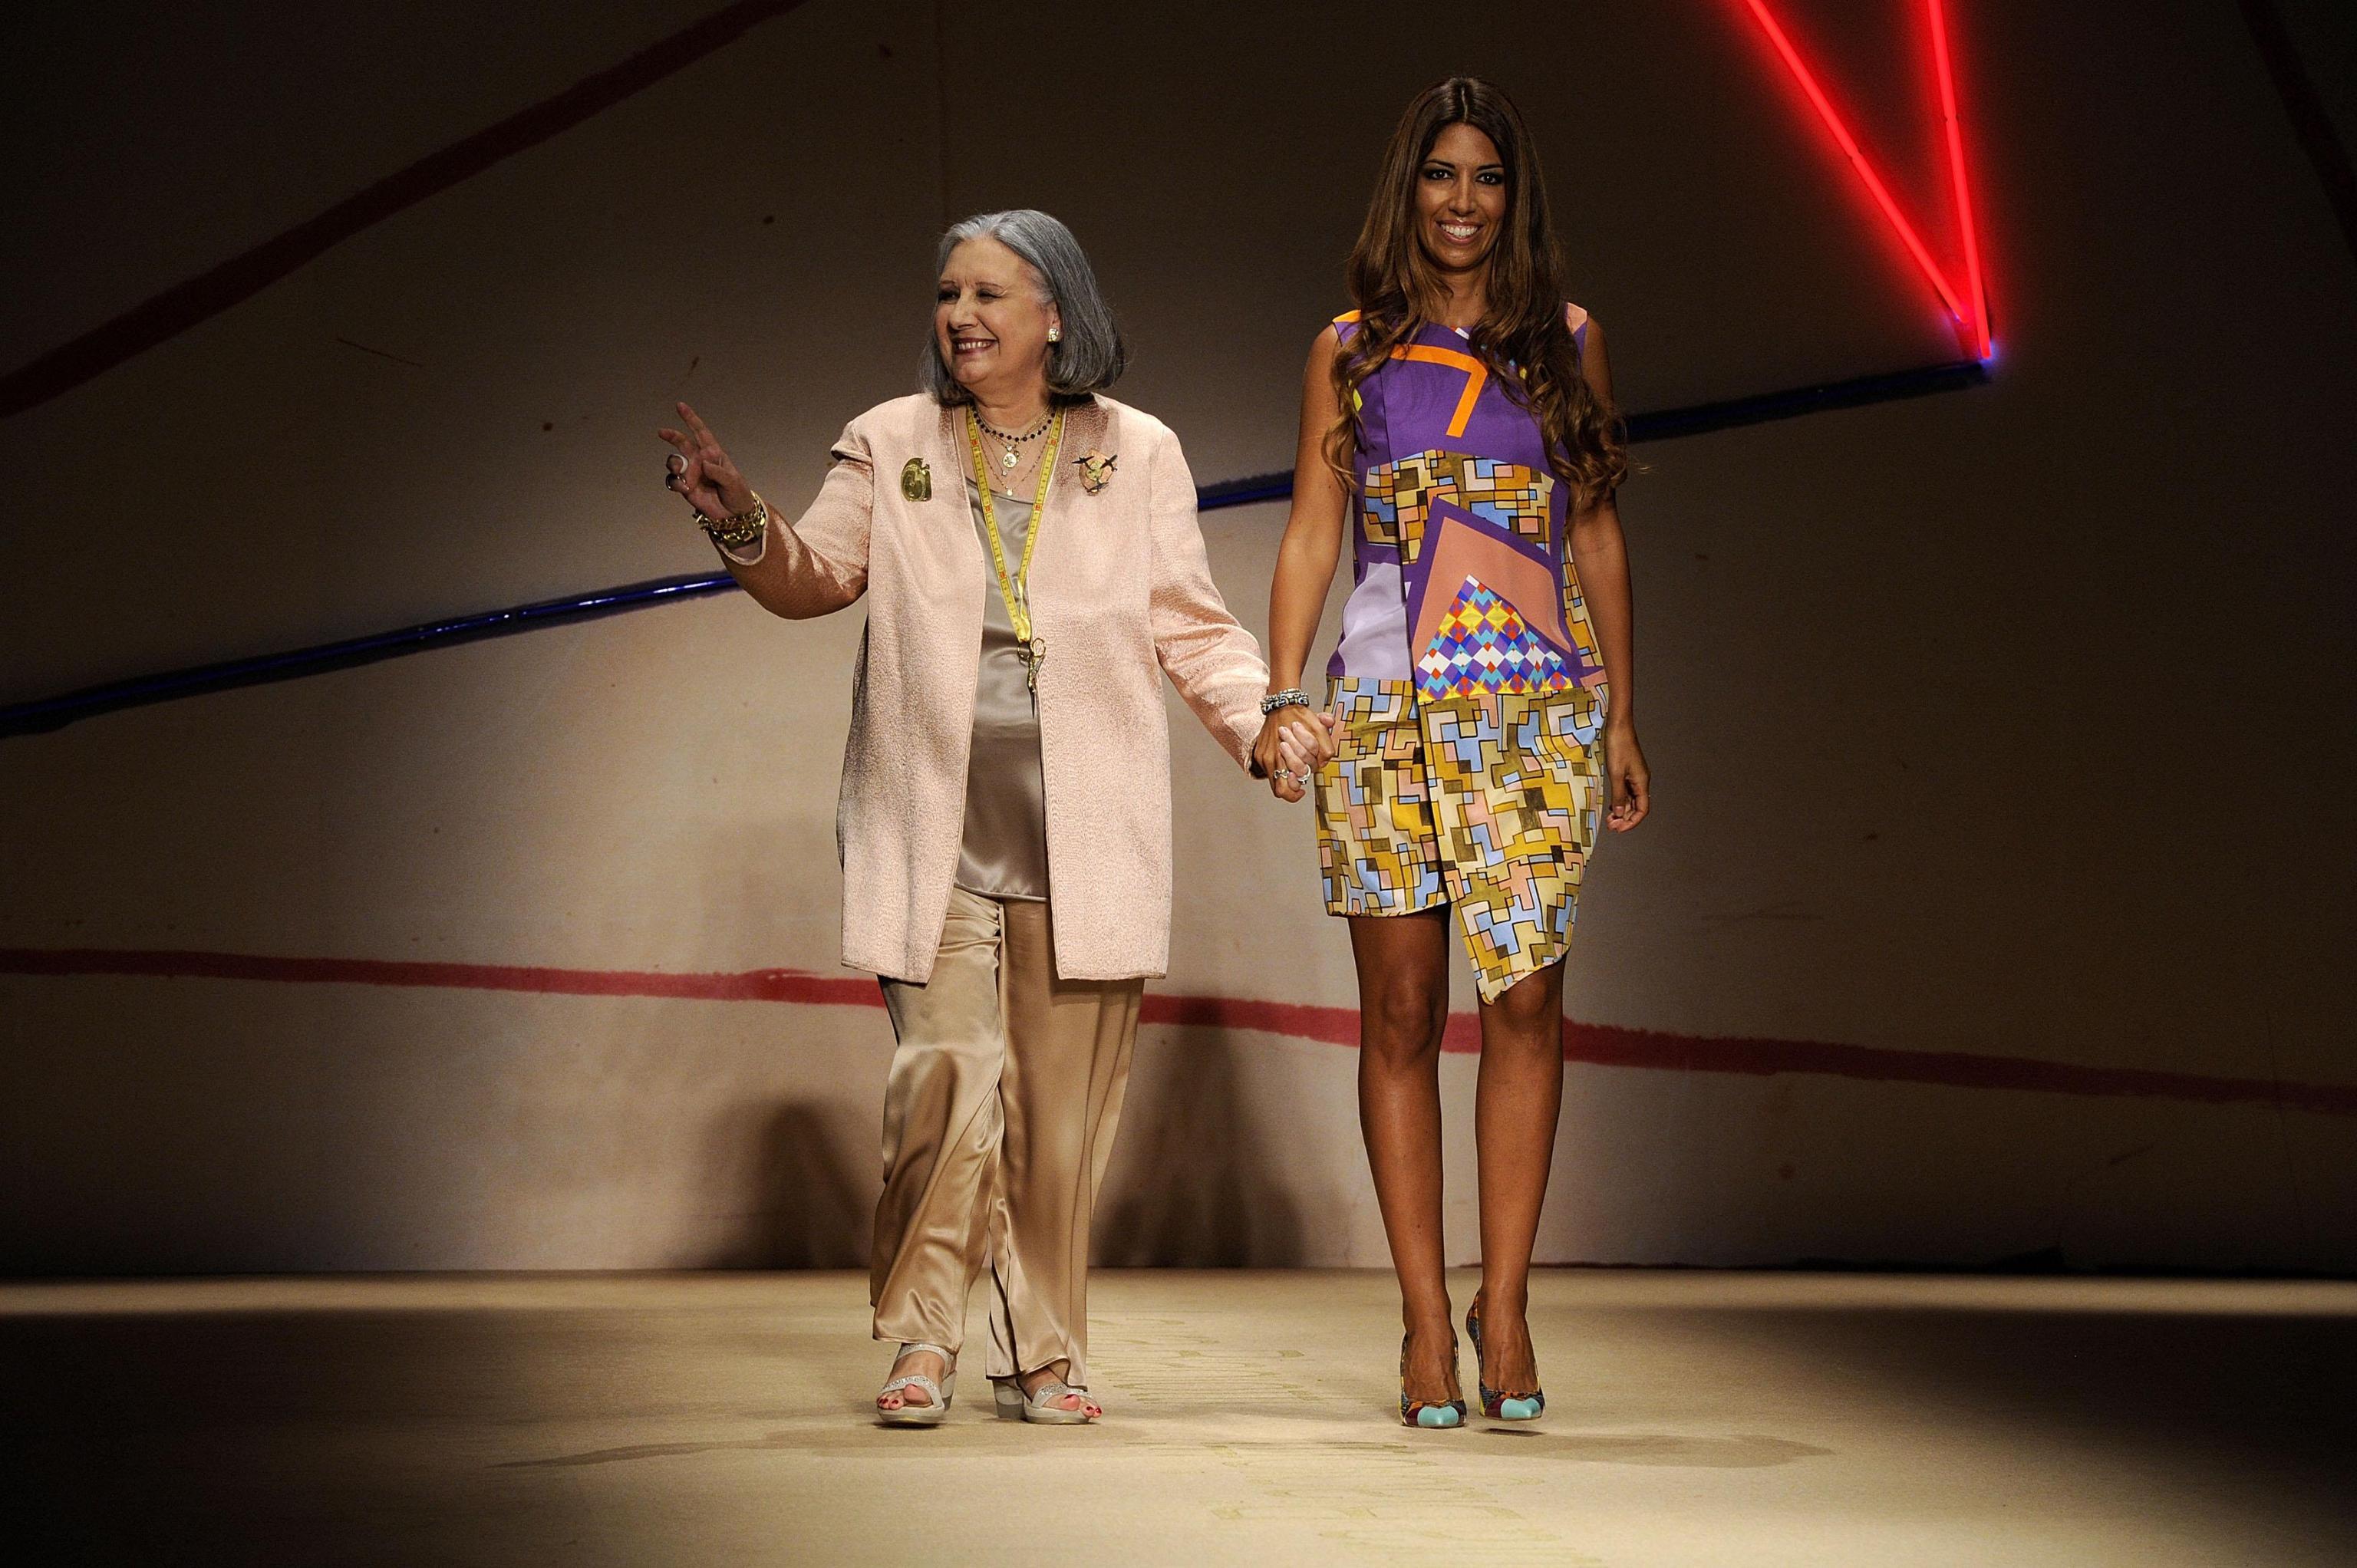 2014 Milan Fashion Week, Laura Biagiotti